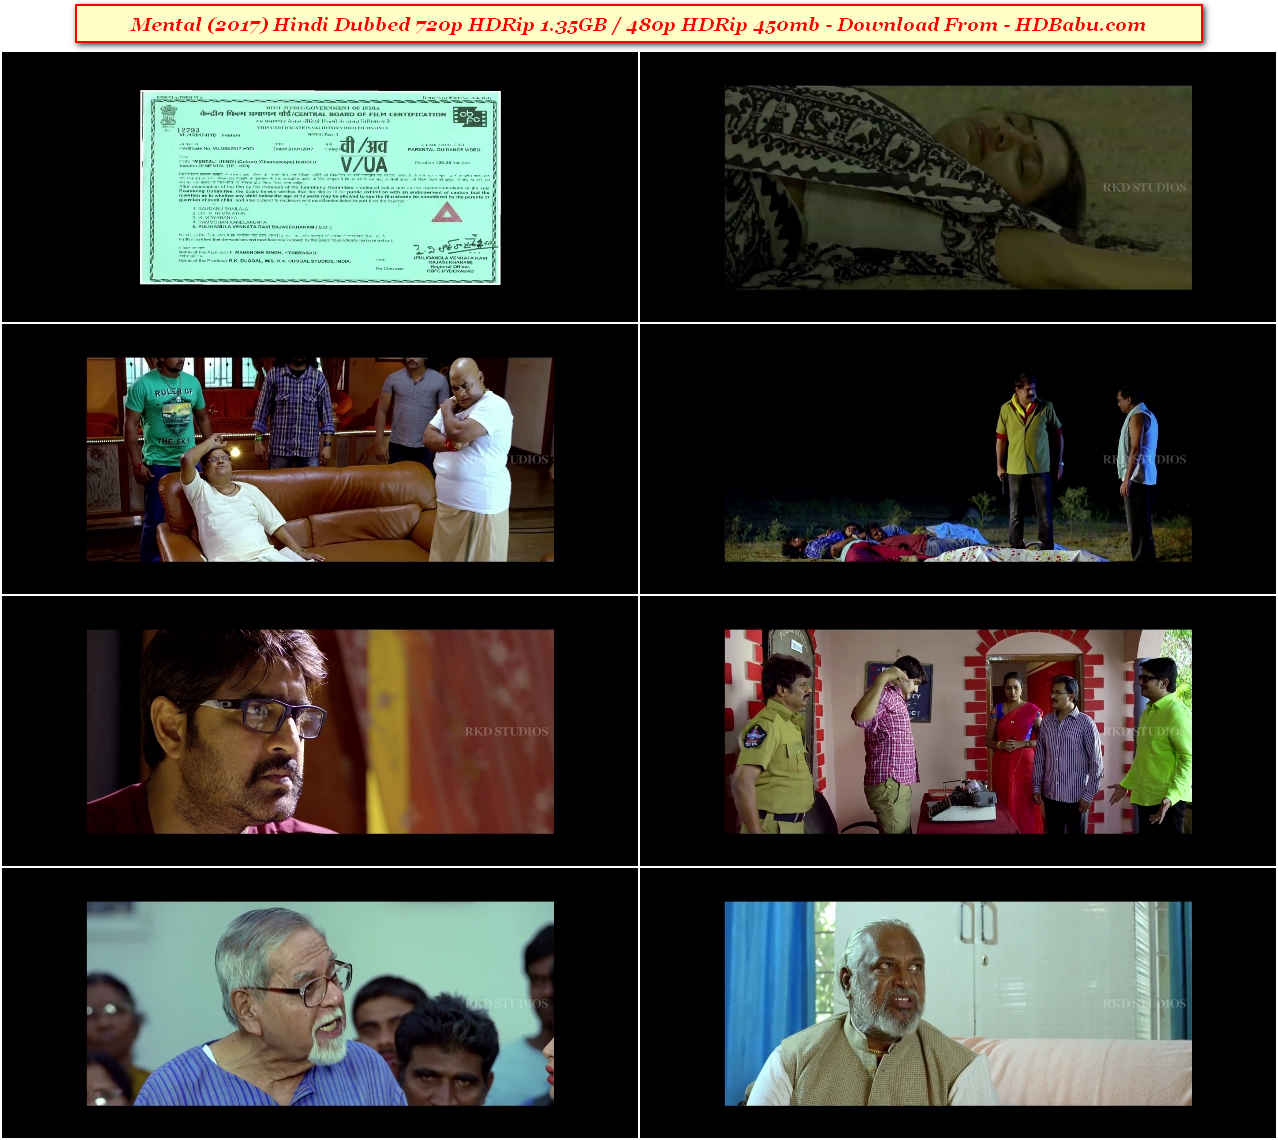 Mental Hindi Dubbed Movie Download